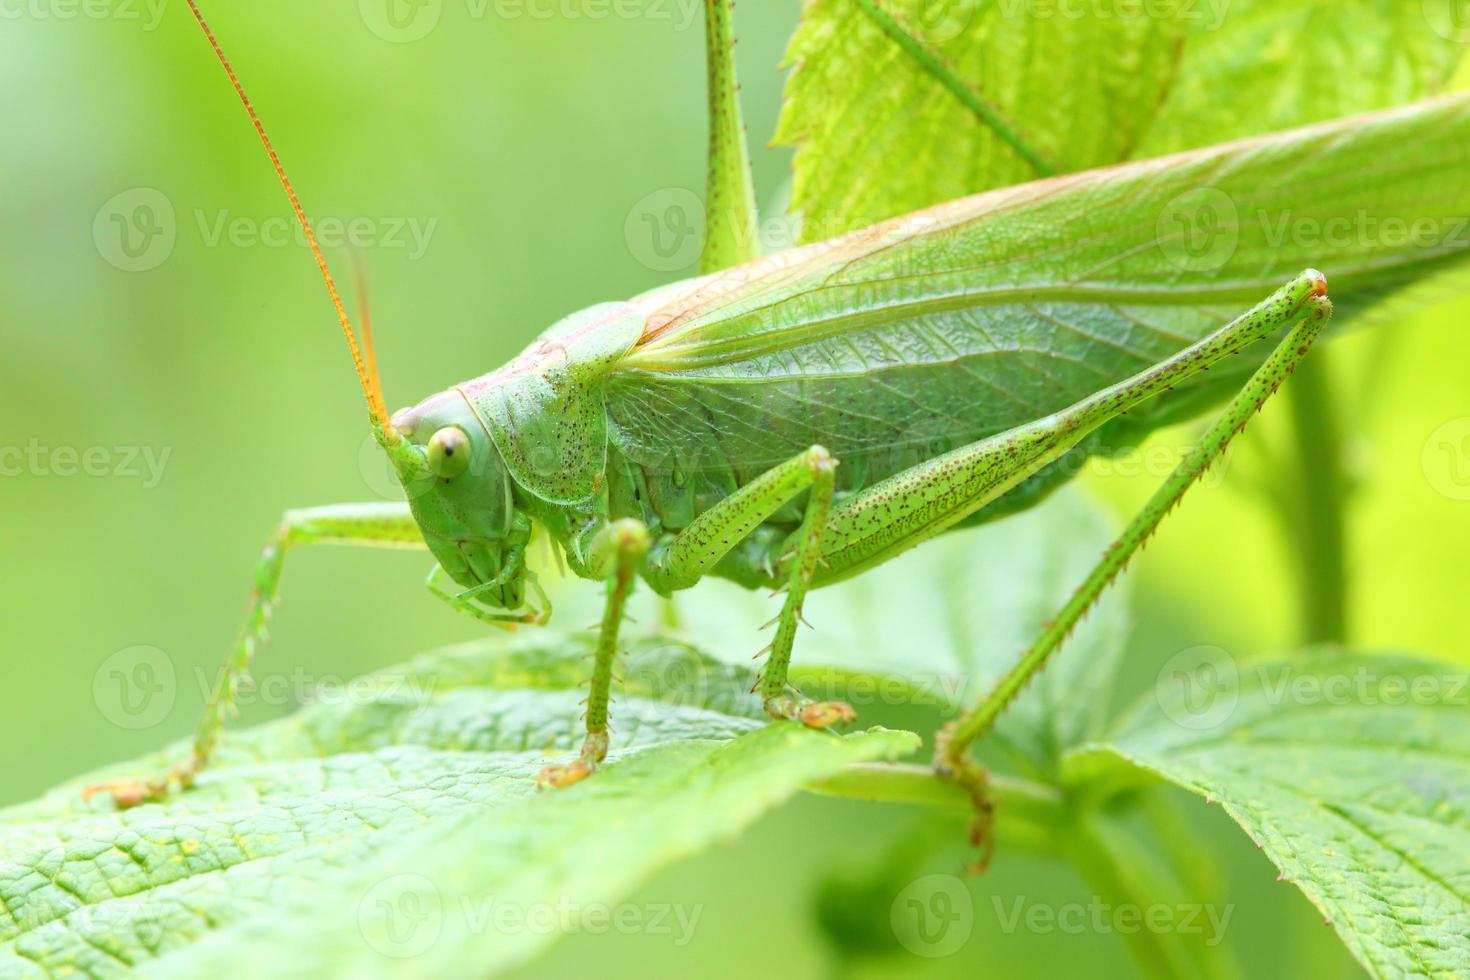 Heuschrecke grün foto